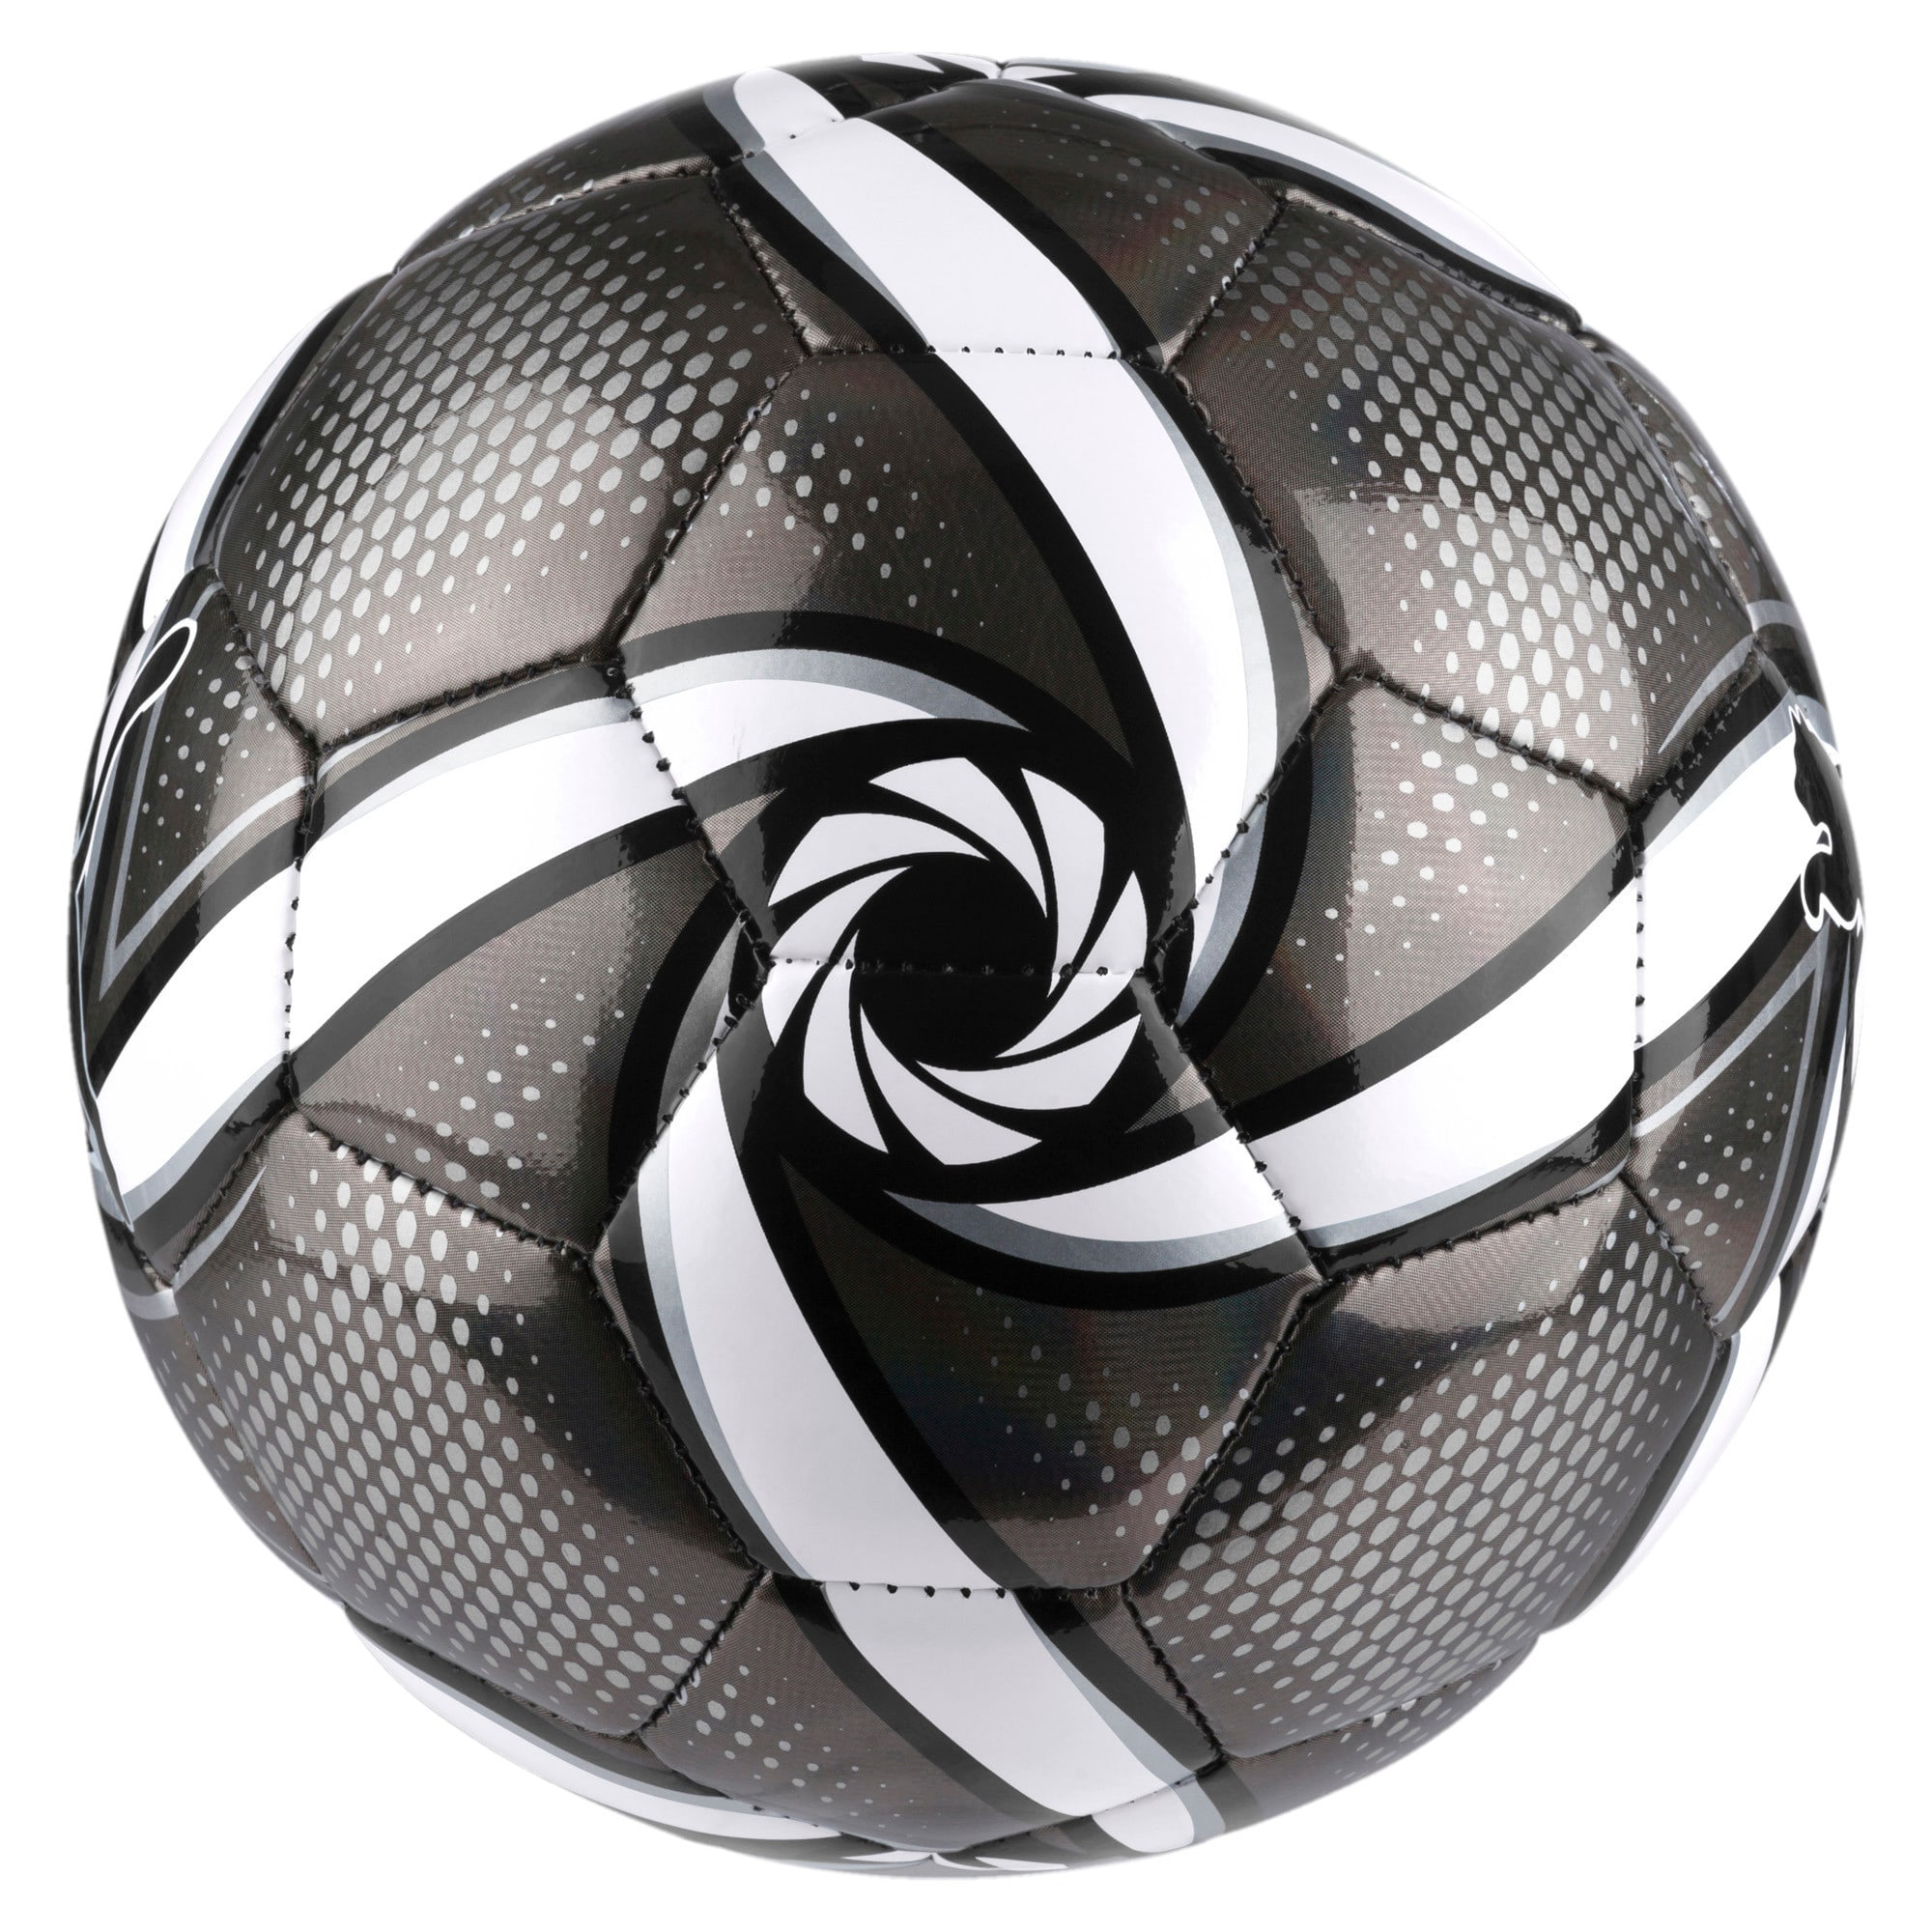 Thumbnail 2 of FUTURE Flare mini ball, Puma Black-Puma White-Silver, medium